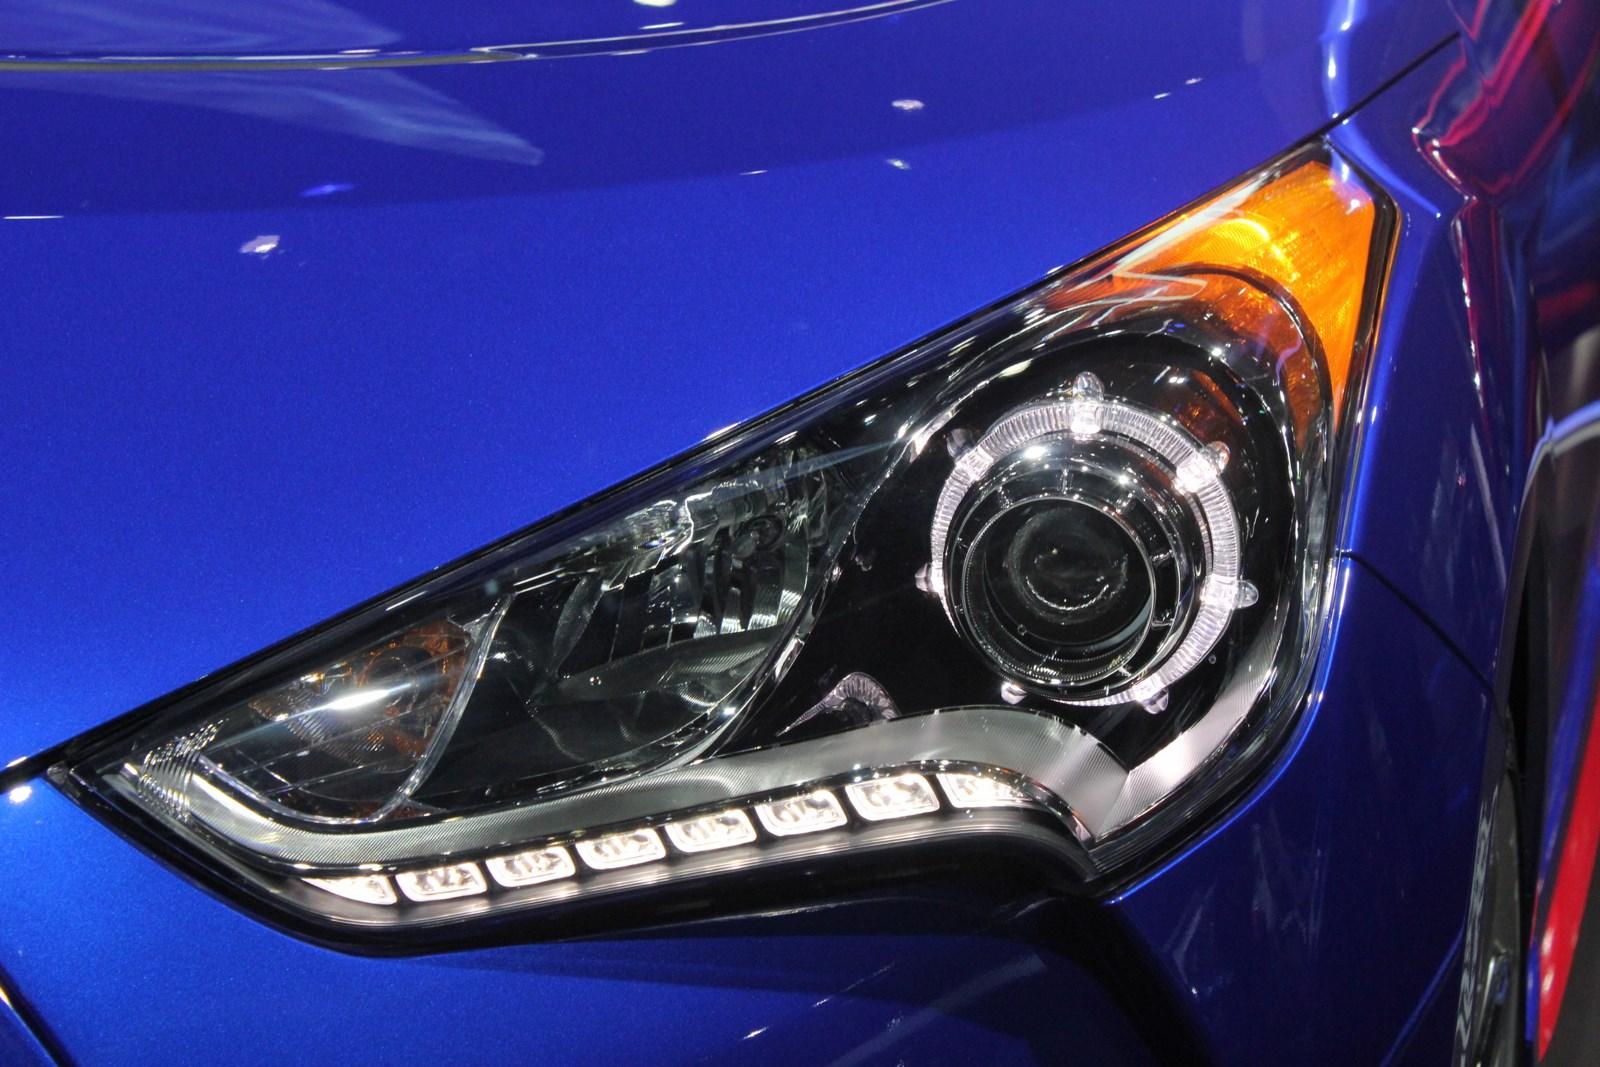 2014 Hyundai Veloster Turbo R-Spec headlight